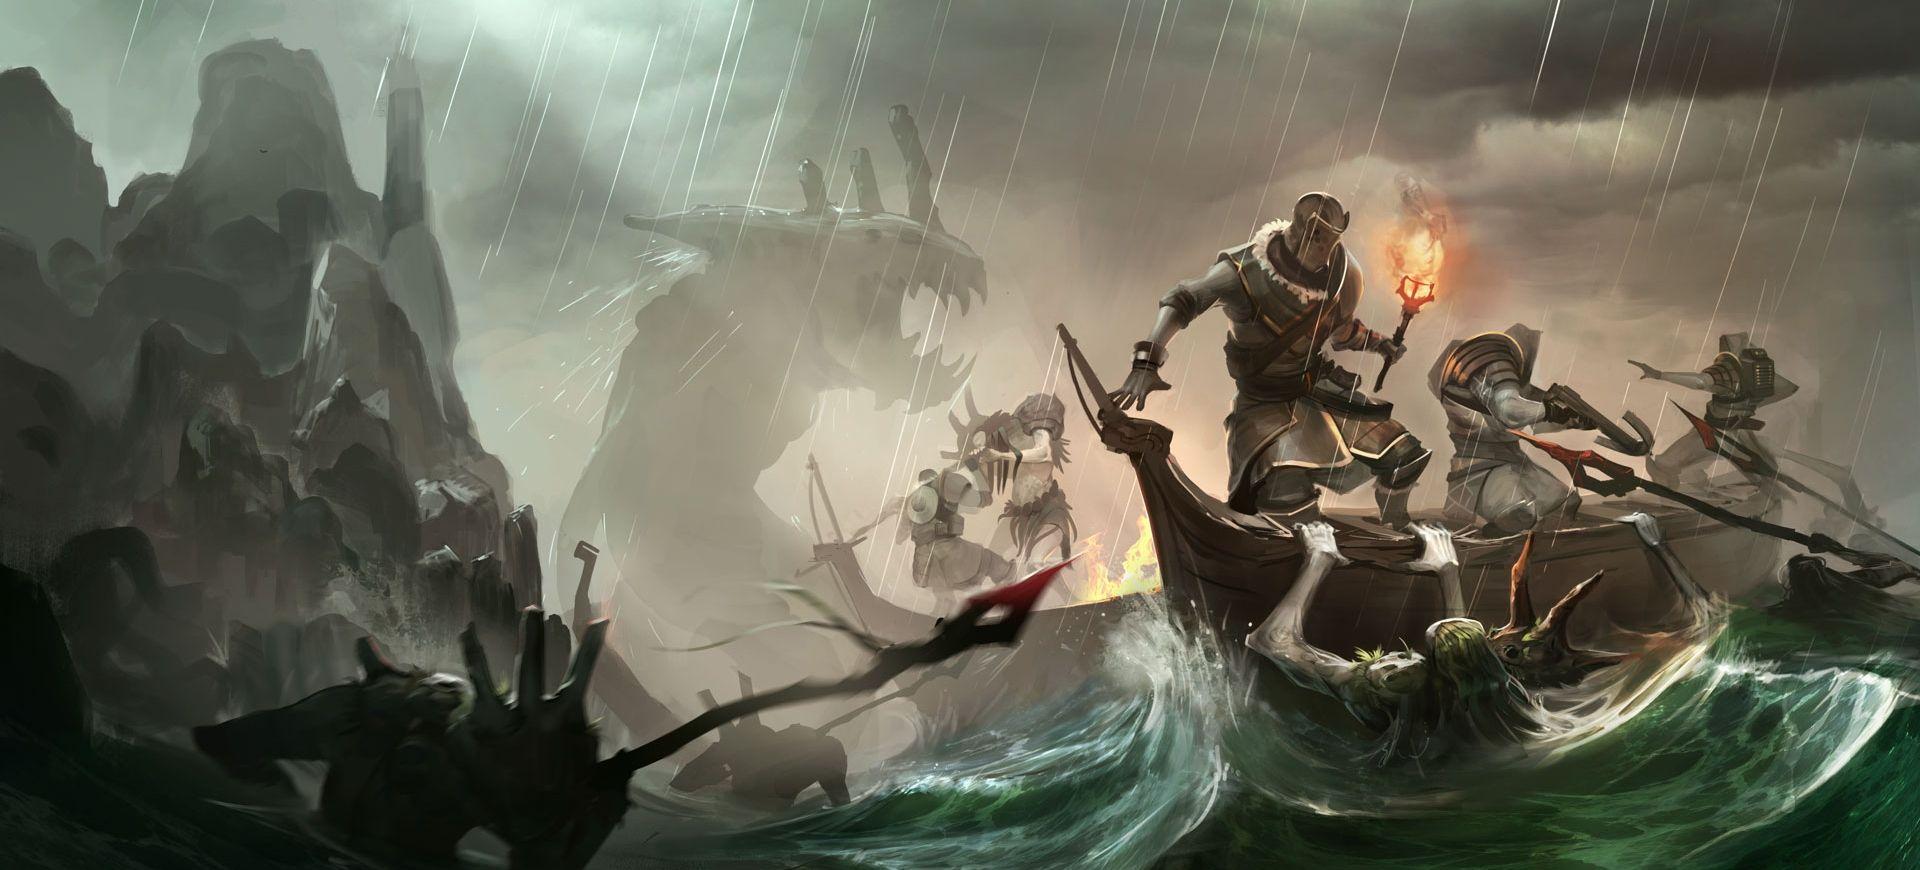 Endless Legend: Tempest - Đánh Giá Game